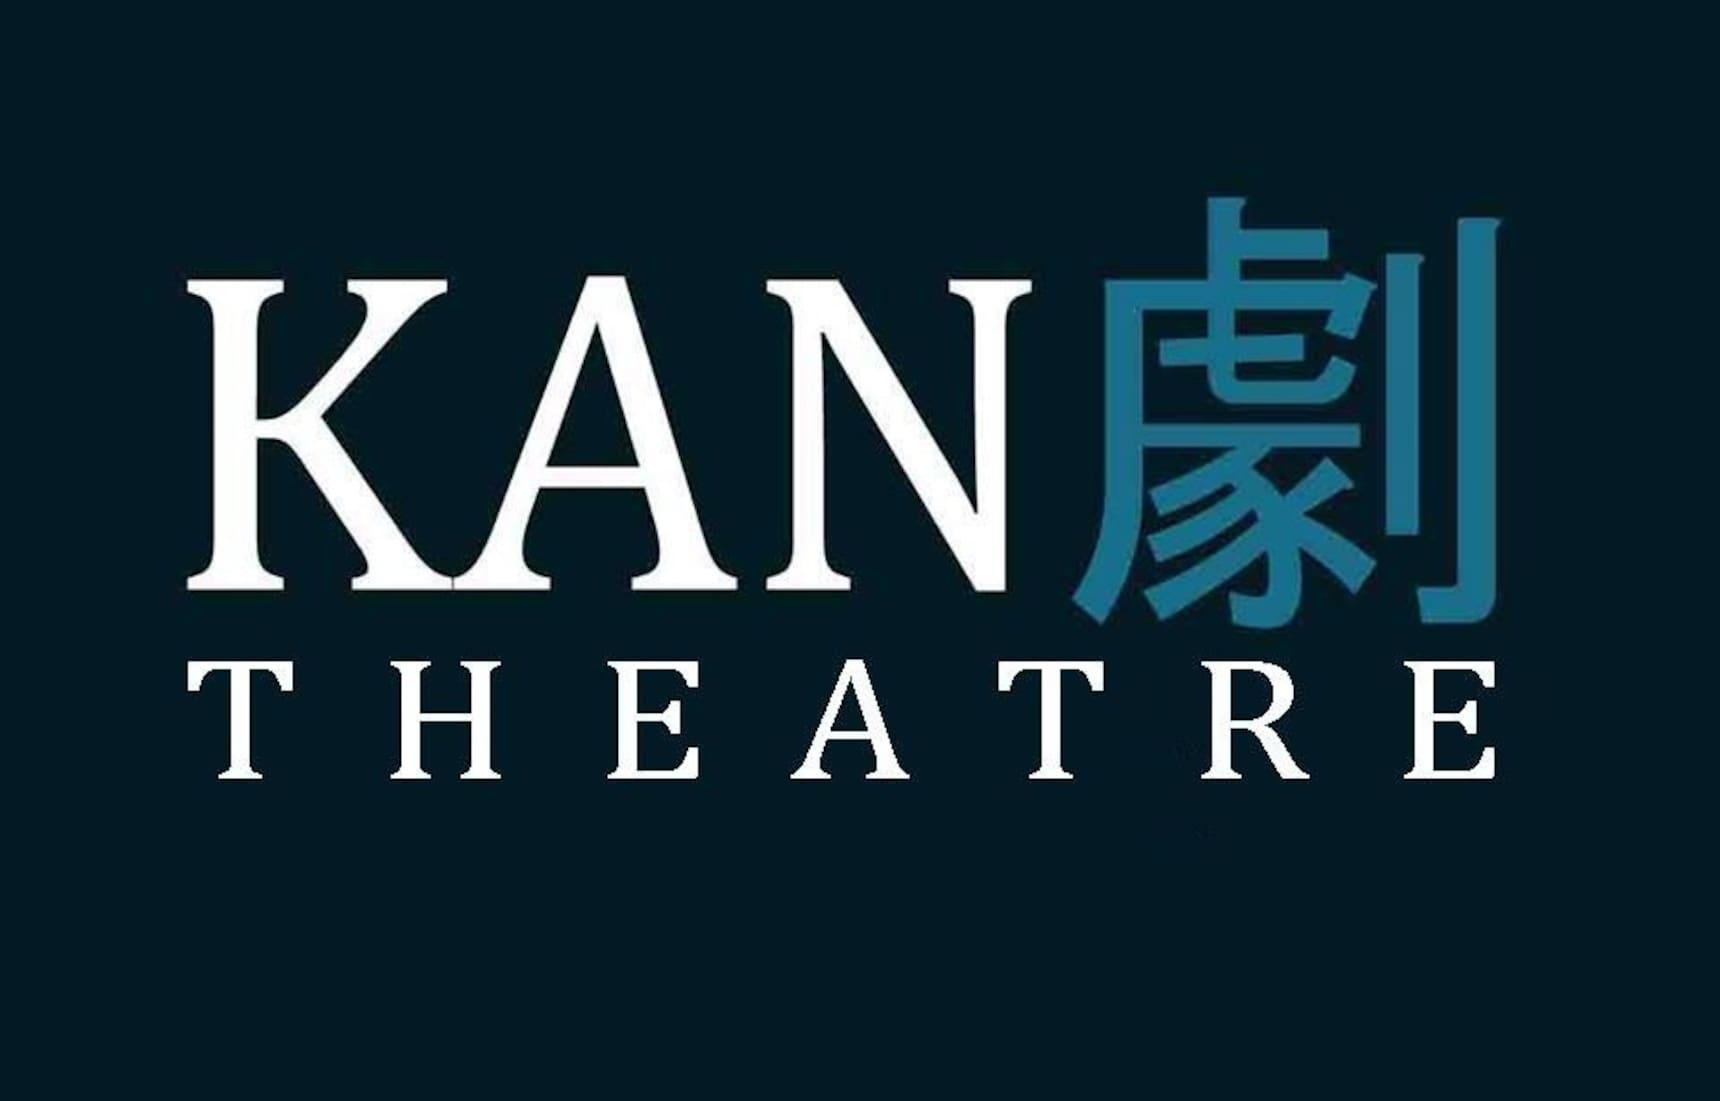 All About Kangeki Theatre